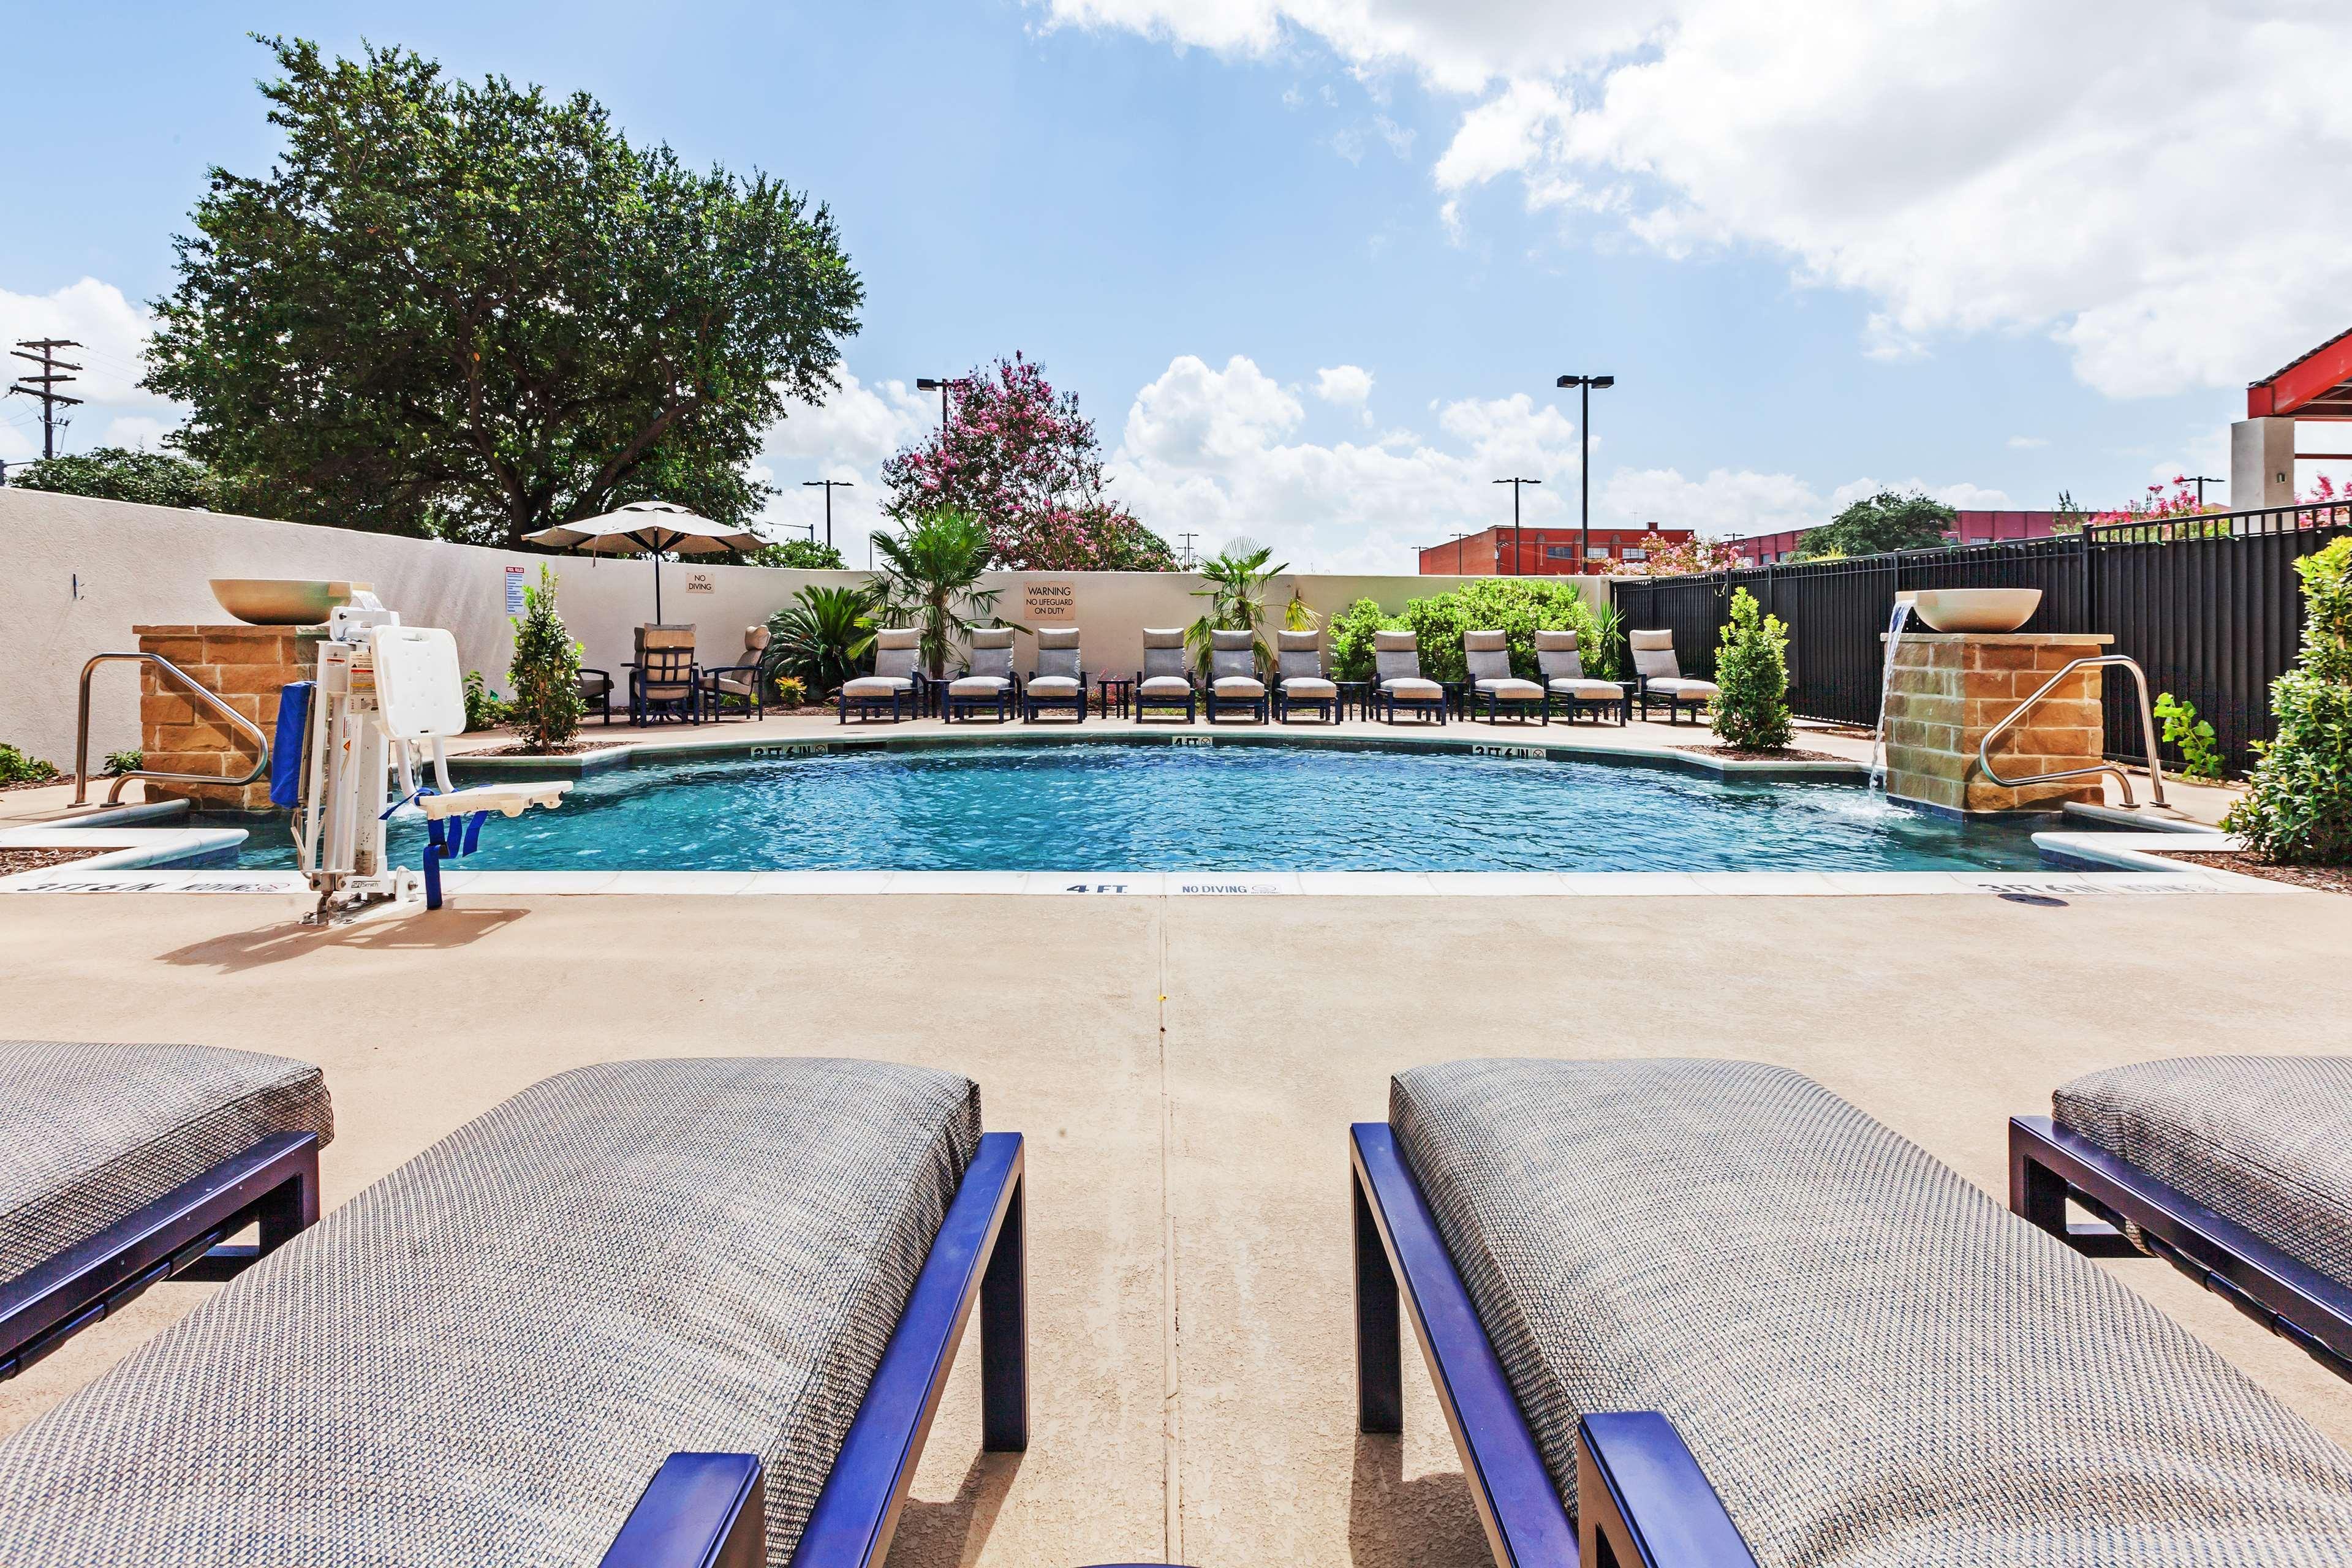 Hilton Waco image 23